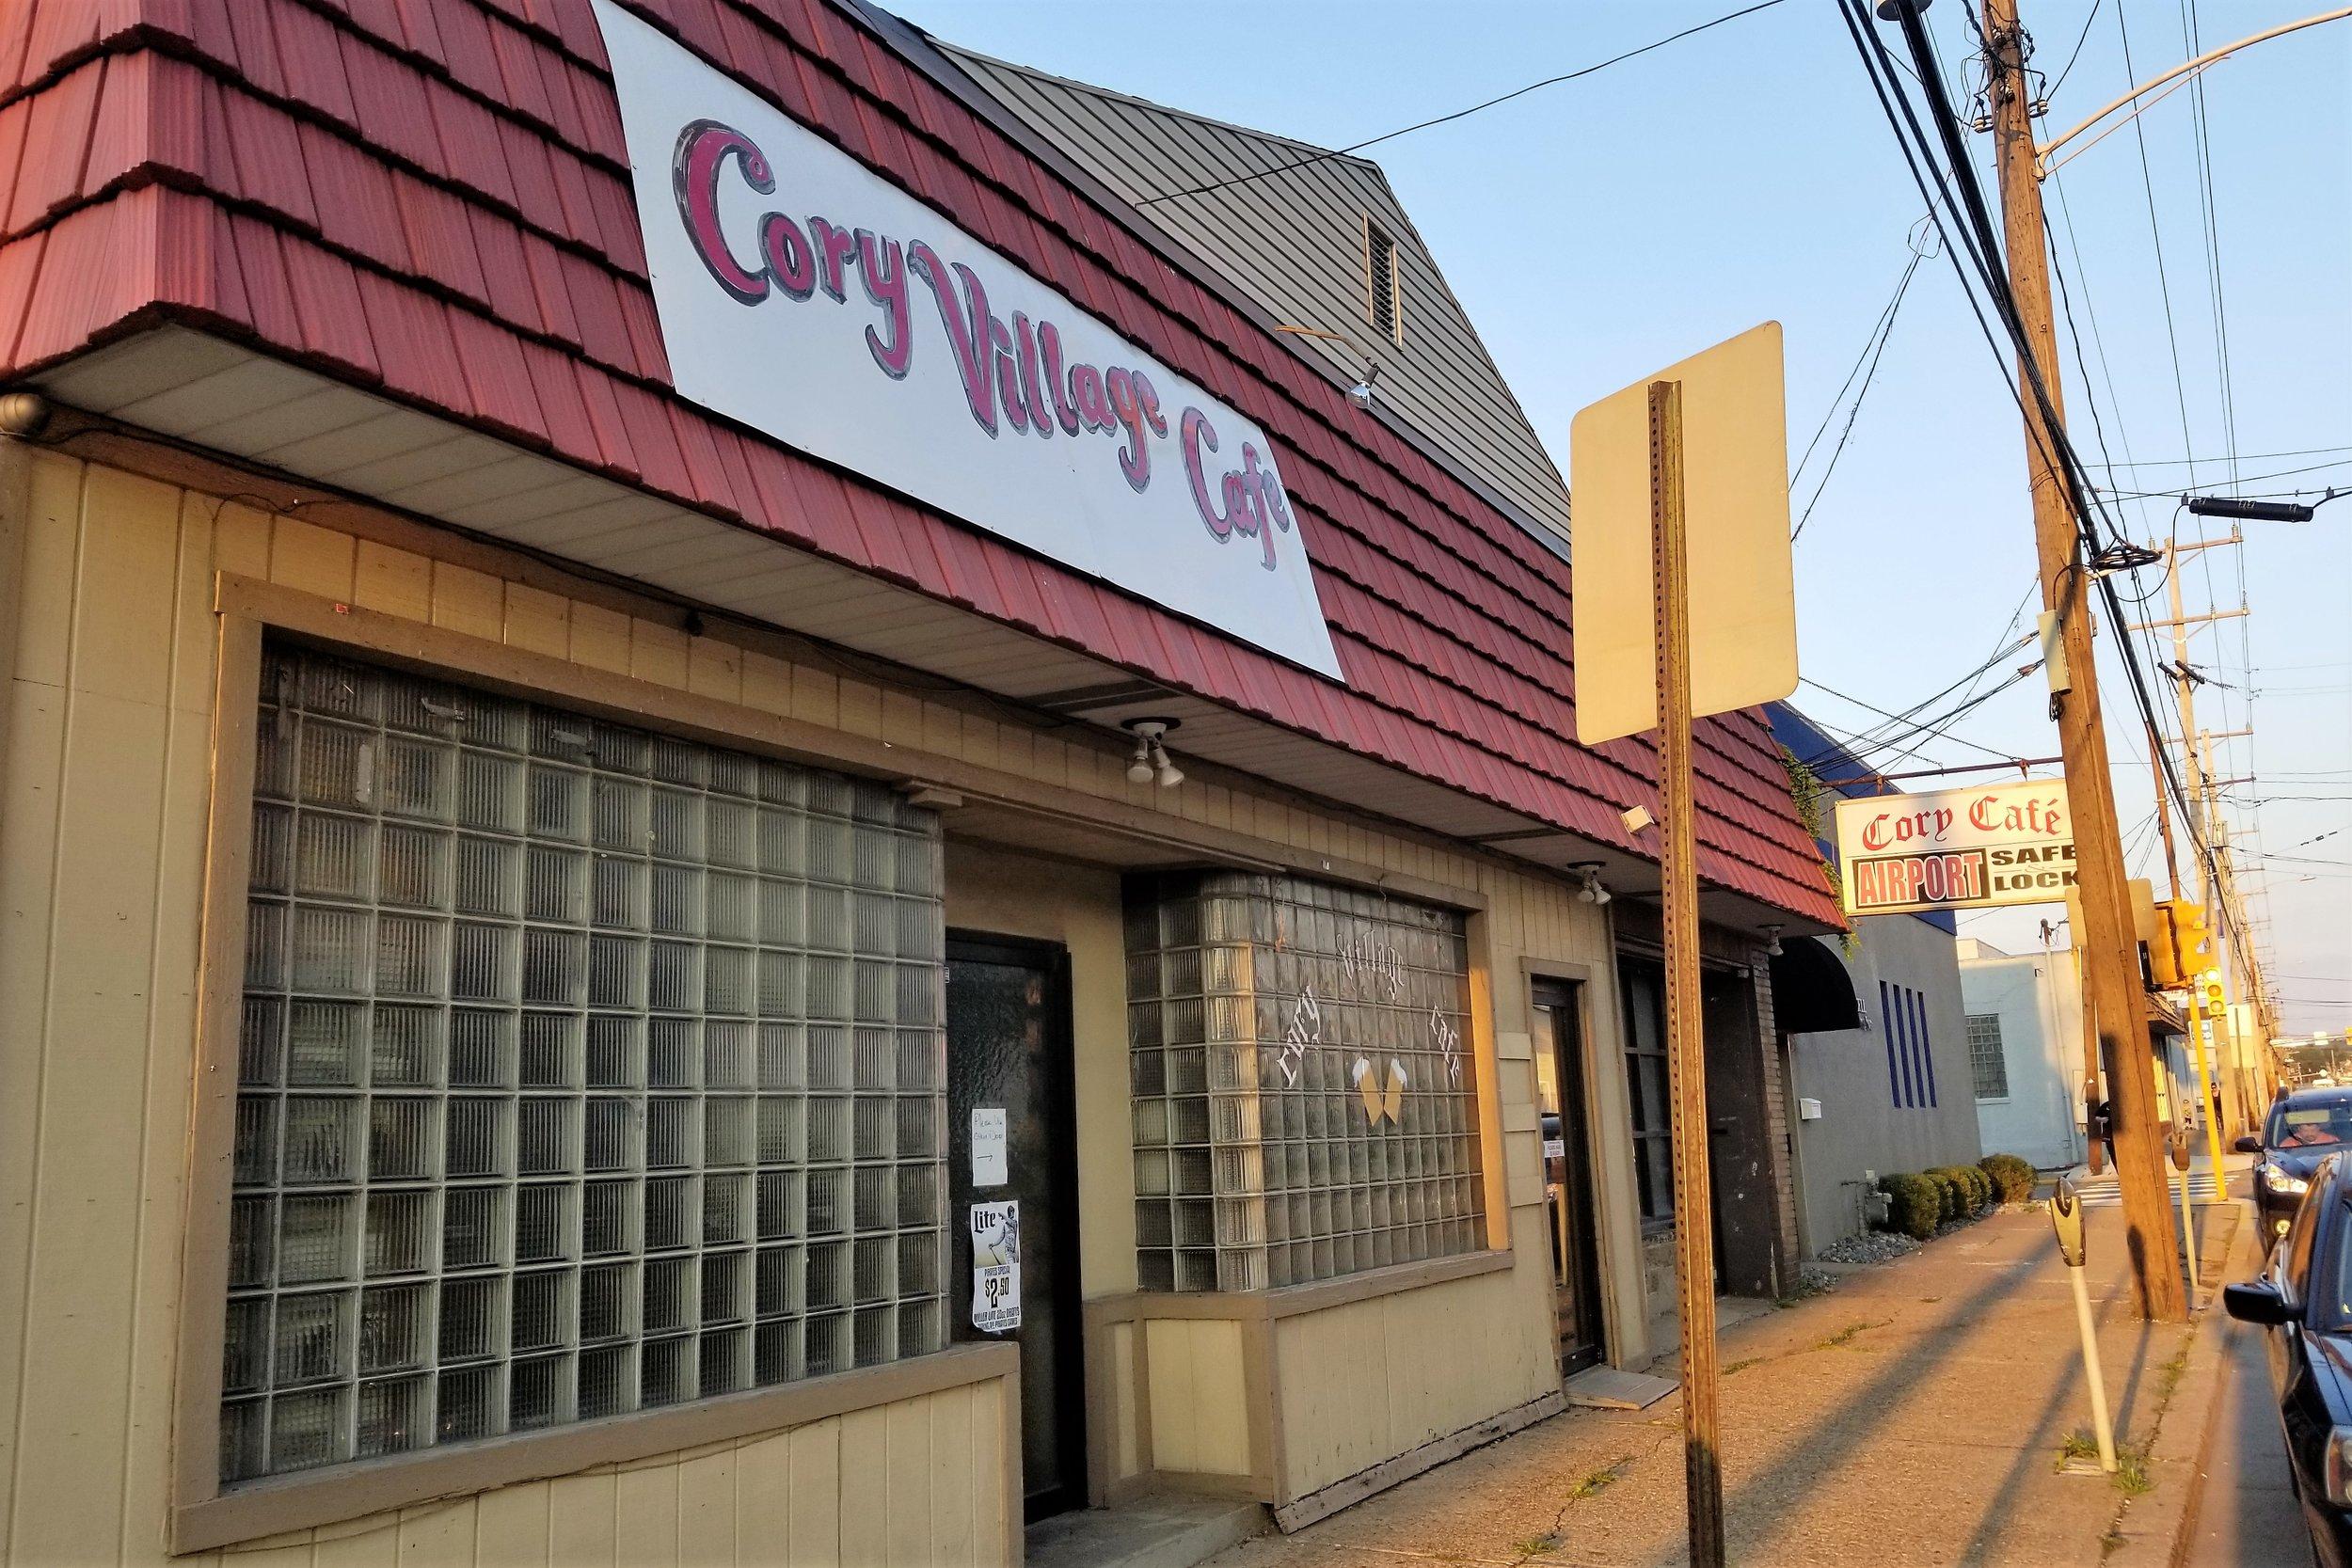 Cory Village Cafe - 1033 4th Ave, (412) 264-5575